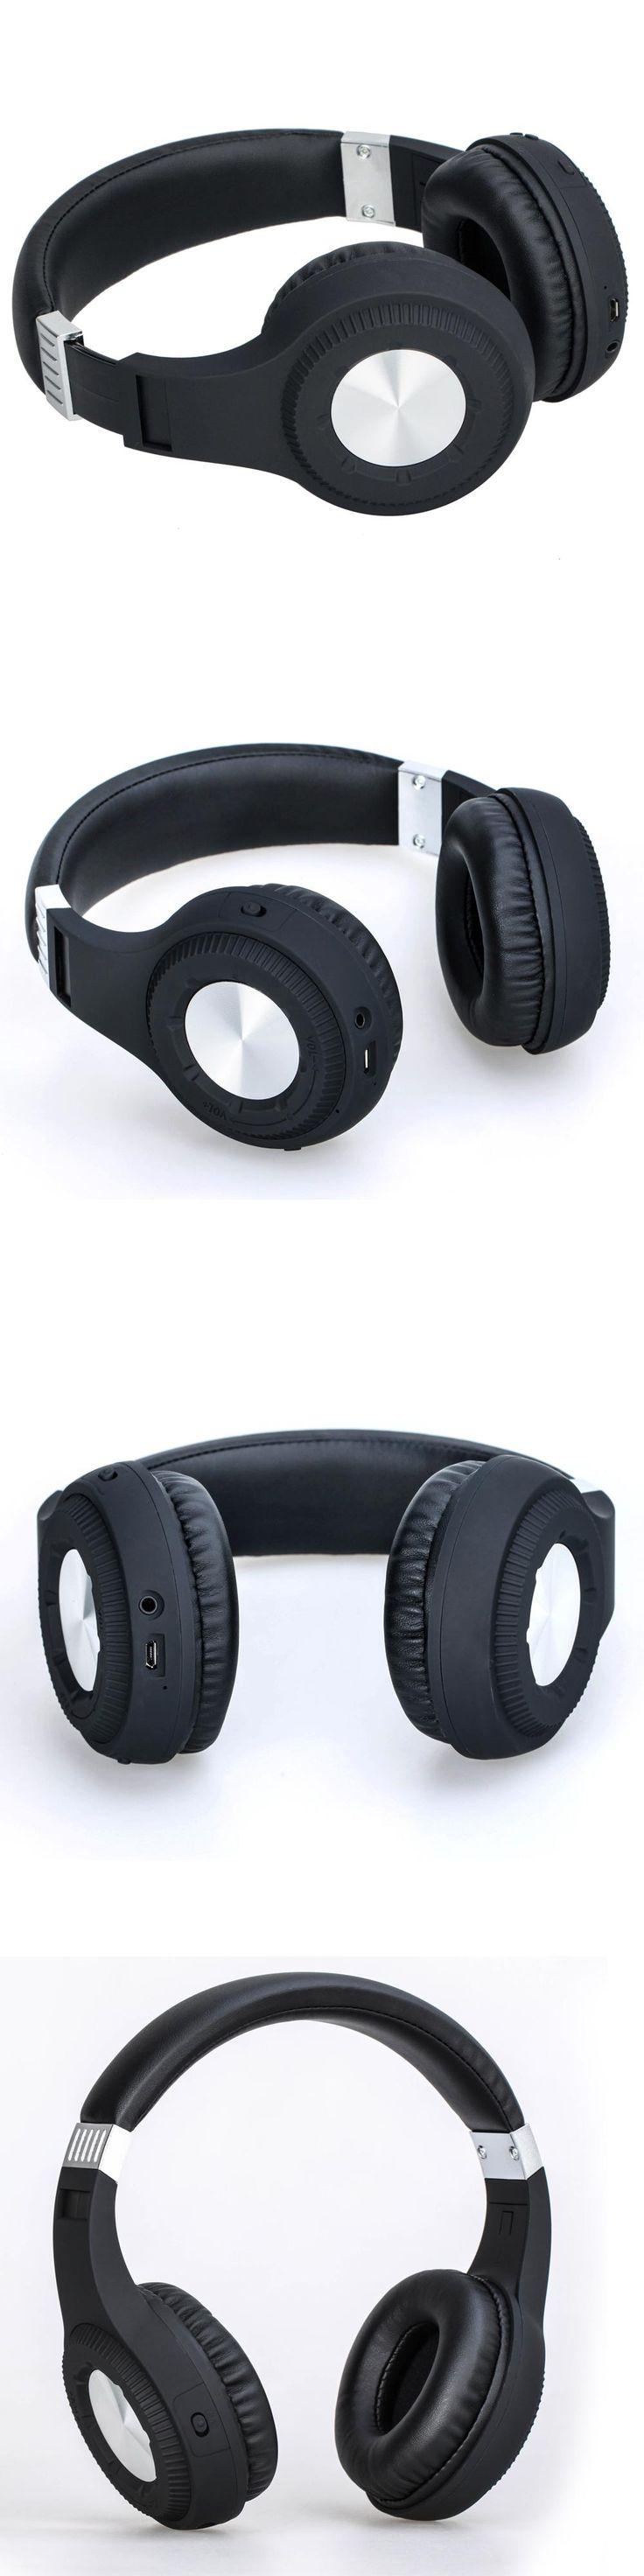 Headset Headphones Best Bluetooth Version 4.1 Wireless Headset Stereo Earphones With Microphone  Built-in Mic Handsfree Calls